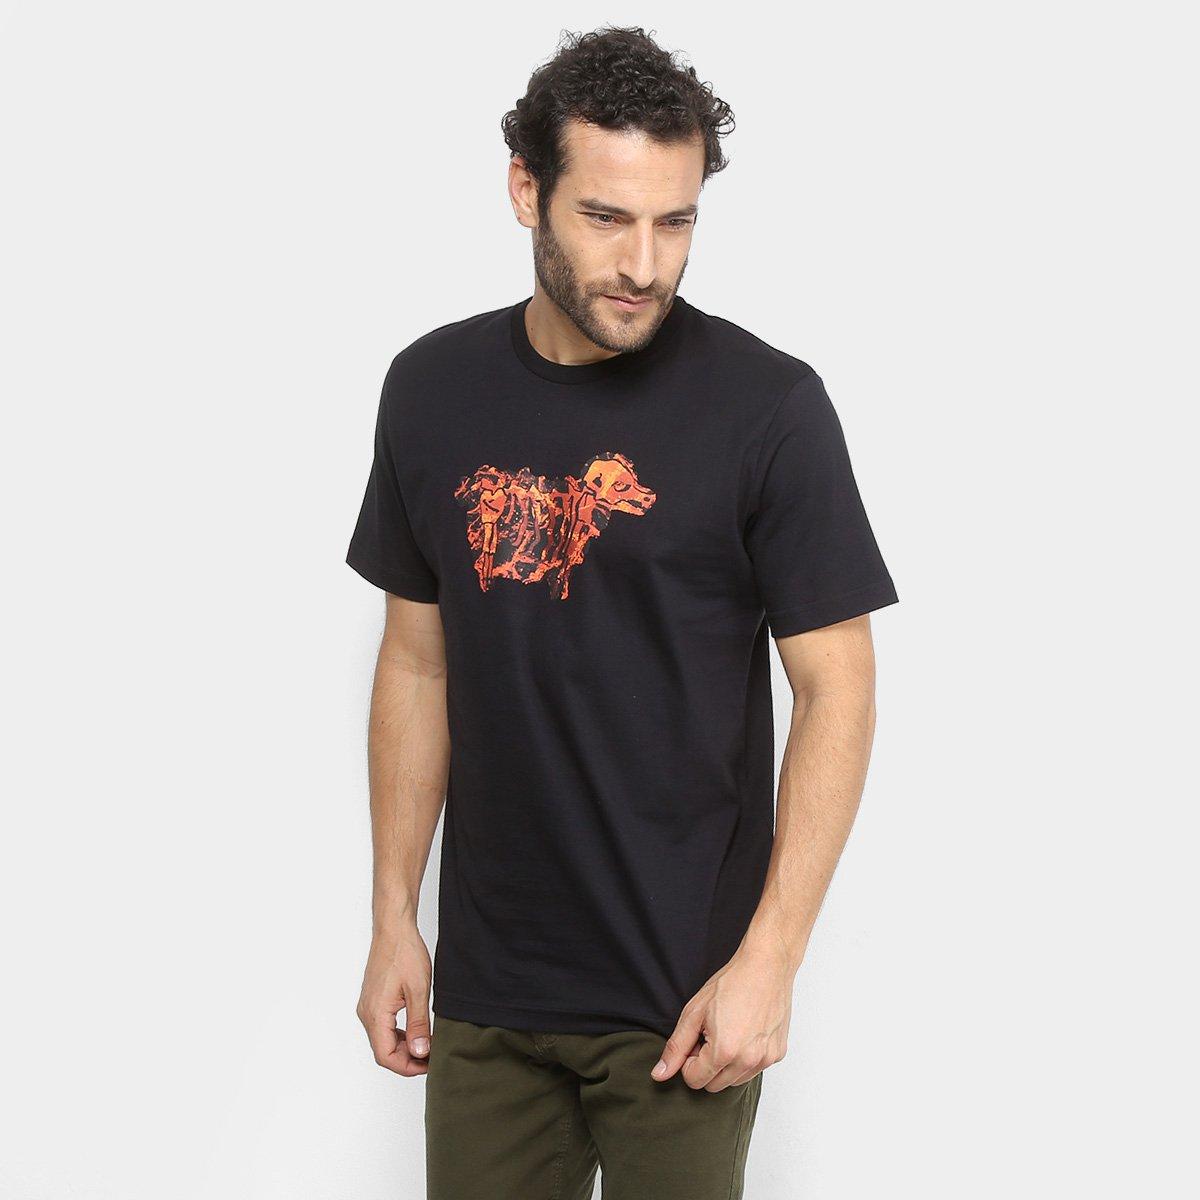 Camiseta Lost Lava Sheep Masculina - Preto - Compre Agora  990b72095d6d4